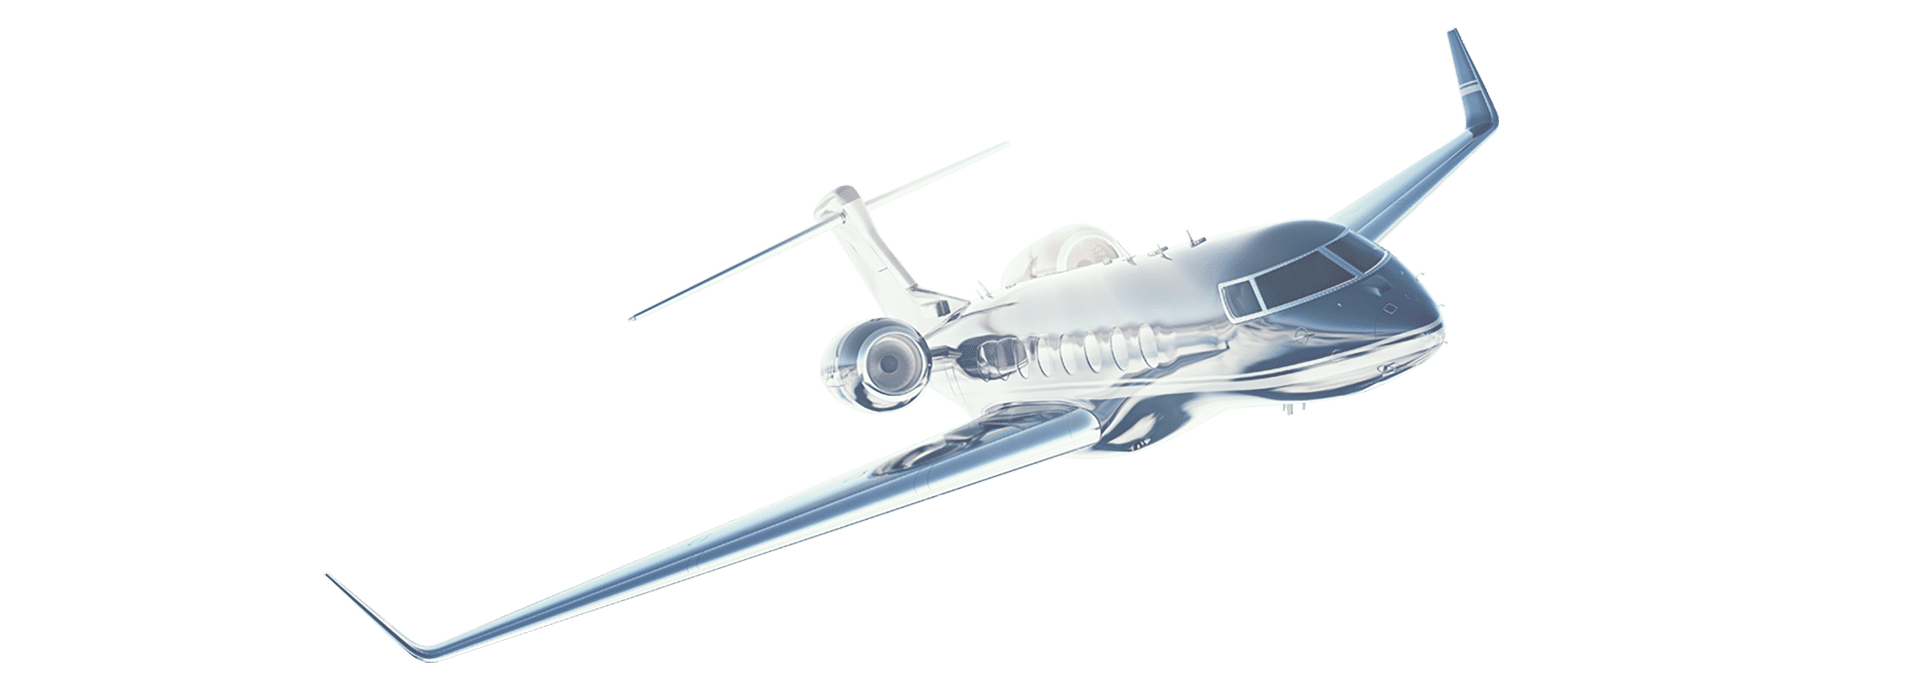 Business-Jet-8